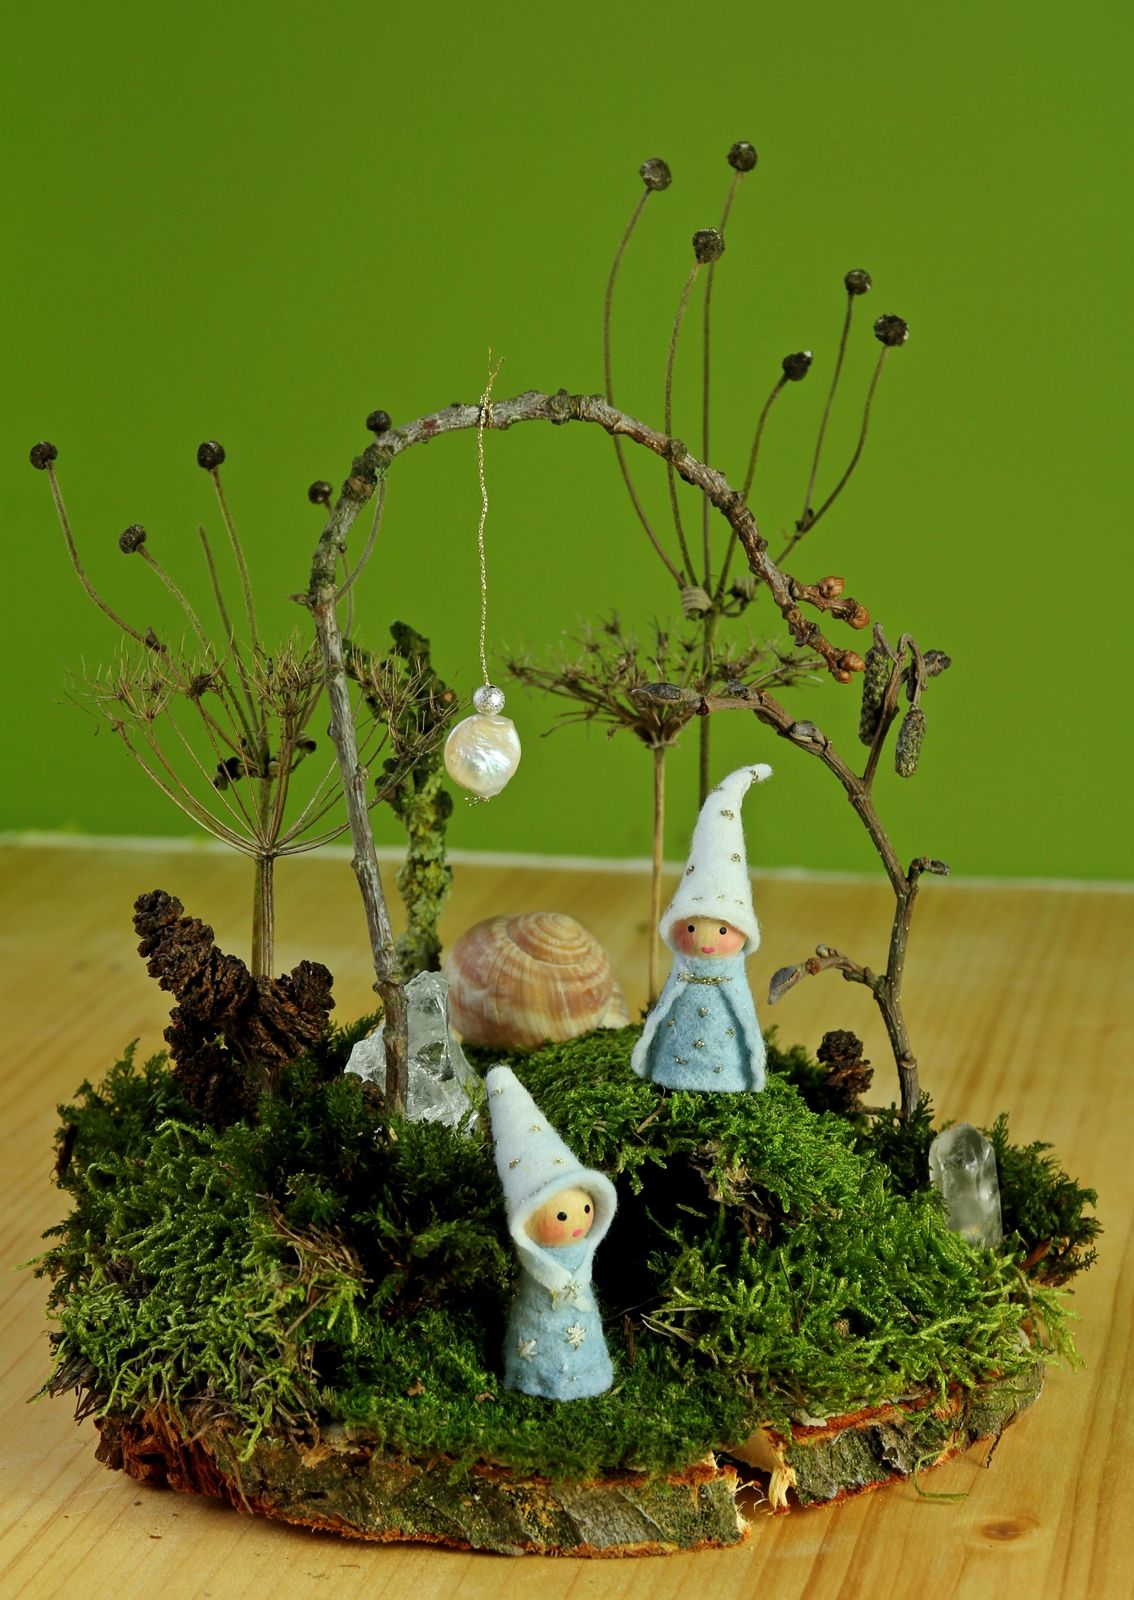 Kathi Pirati: Basteln mit Naturmaterial: Moosgärtchen #weihnachtsbastelnnaturmaterialien